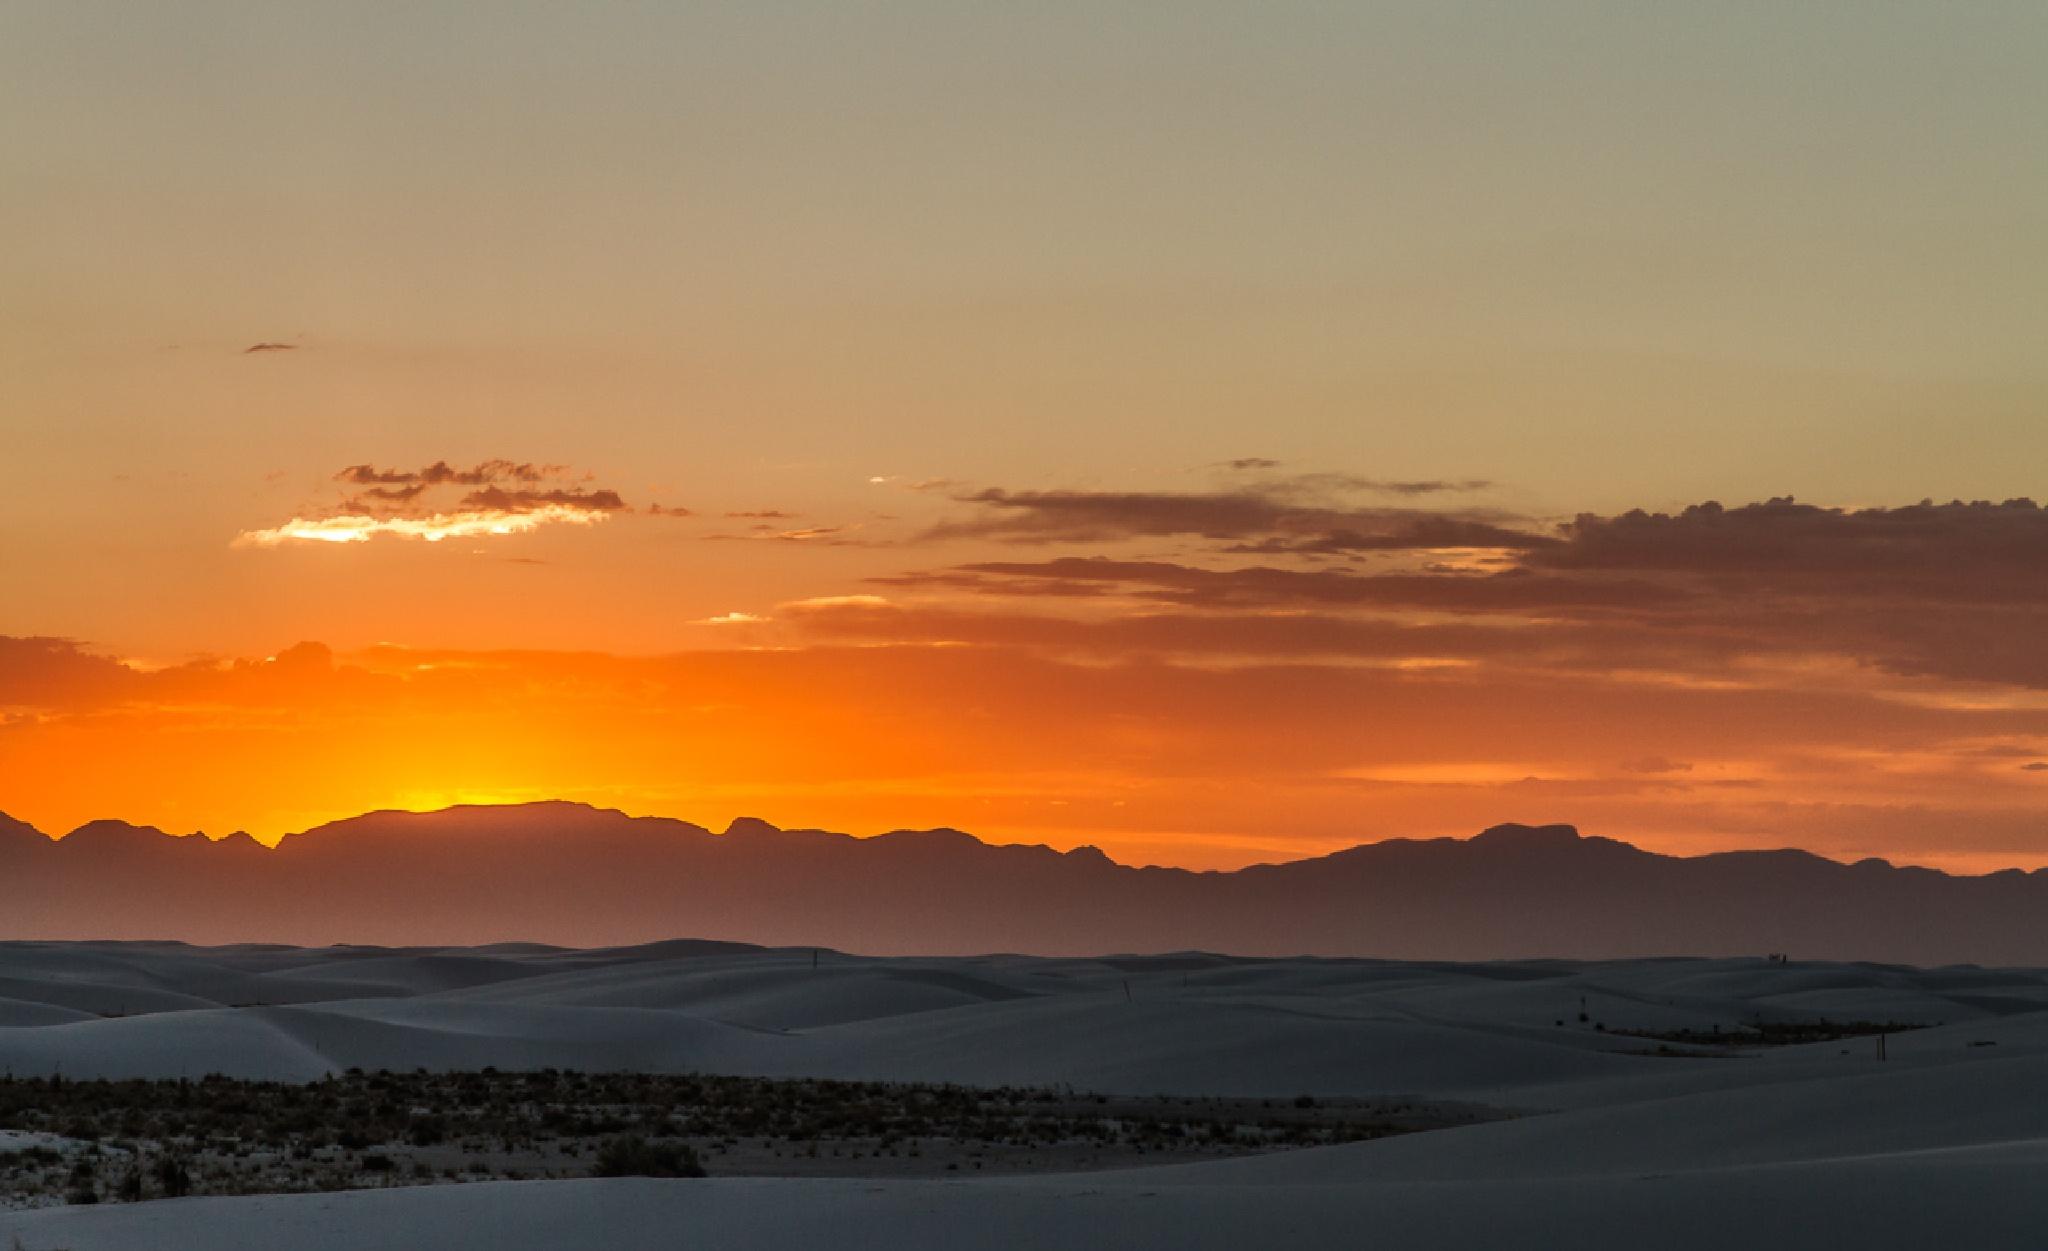 Sunset in the desert by FSFoto